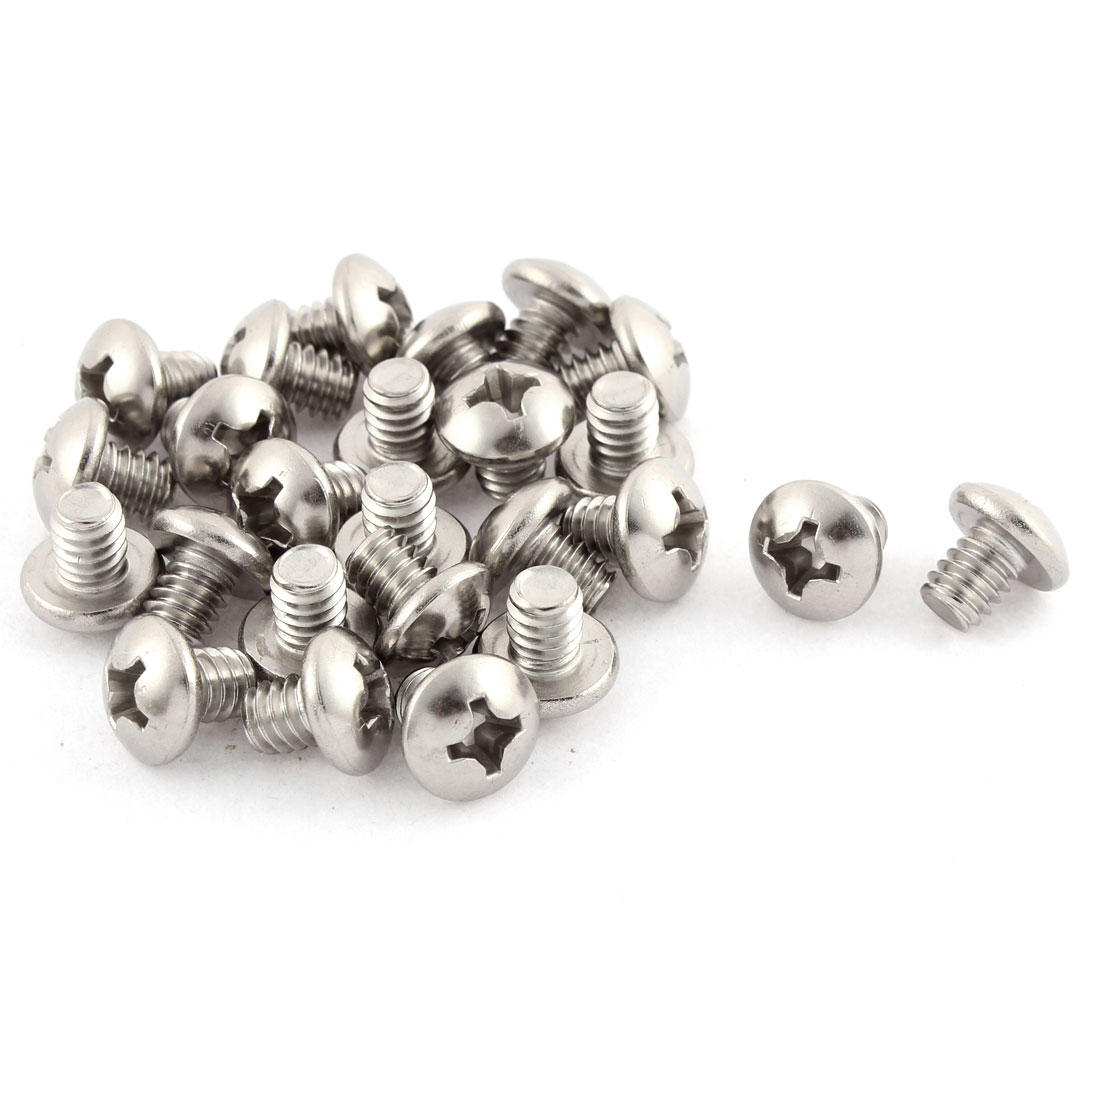 "12mm Long 1/4""x20x5/16"" Stainless Steel Phillips Truss Head Screws 25 Pcs"